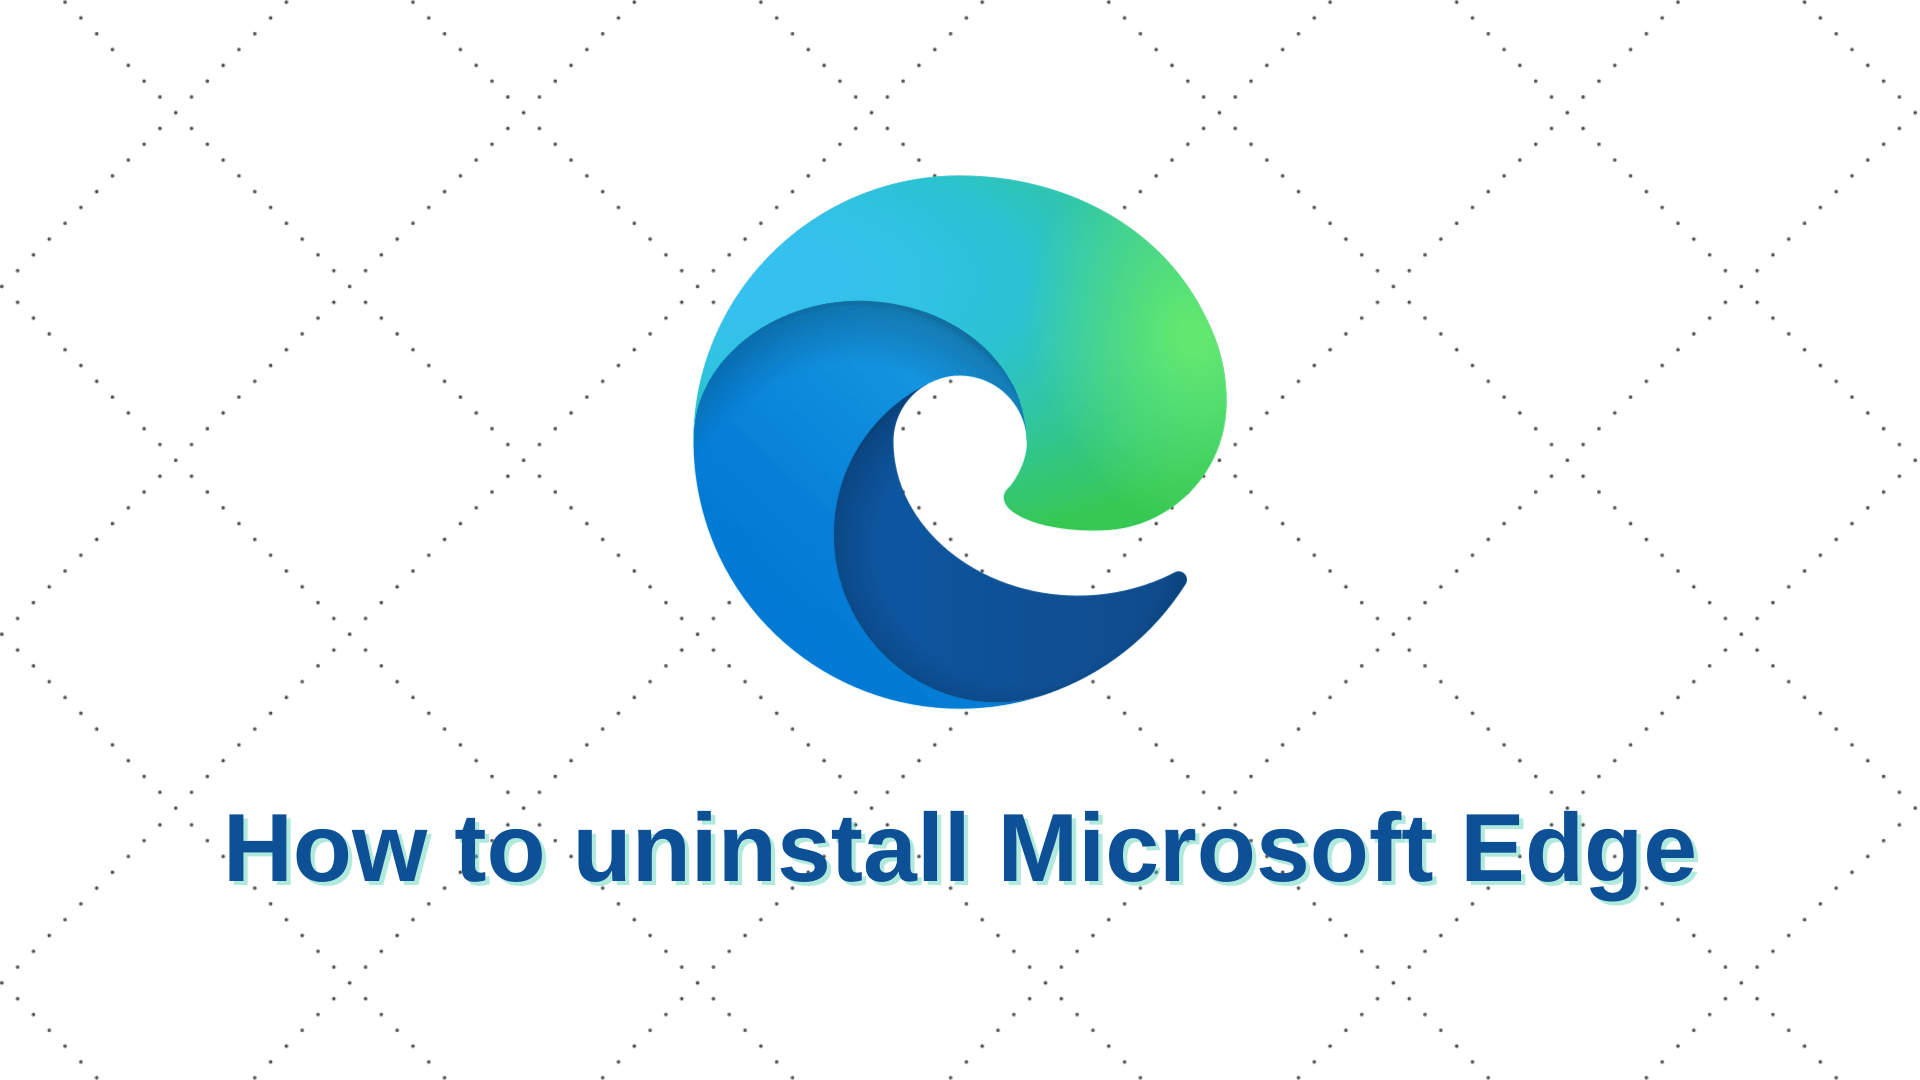 How to Uninstall Microsoft Edge